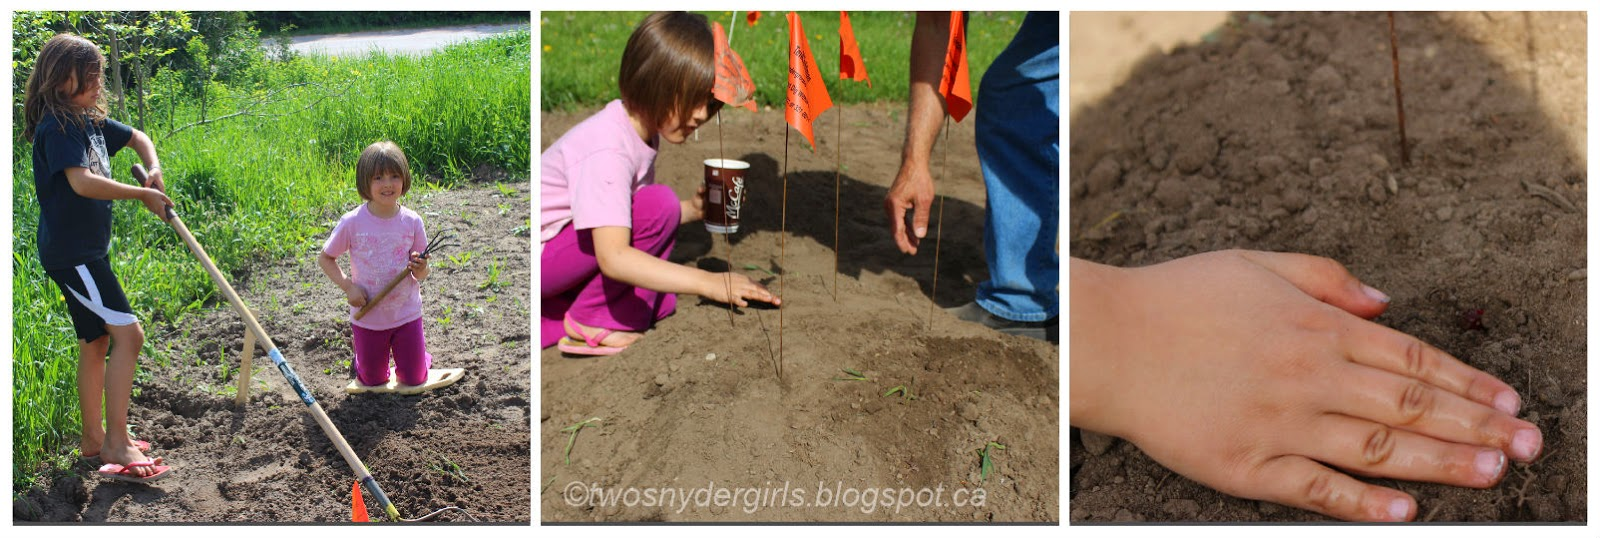 Planting corn seeds